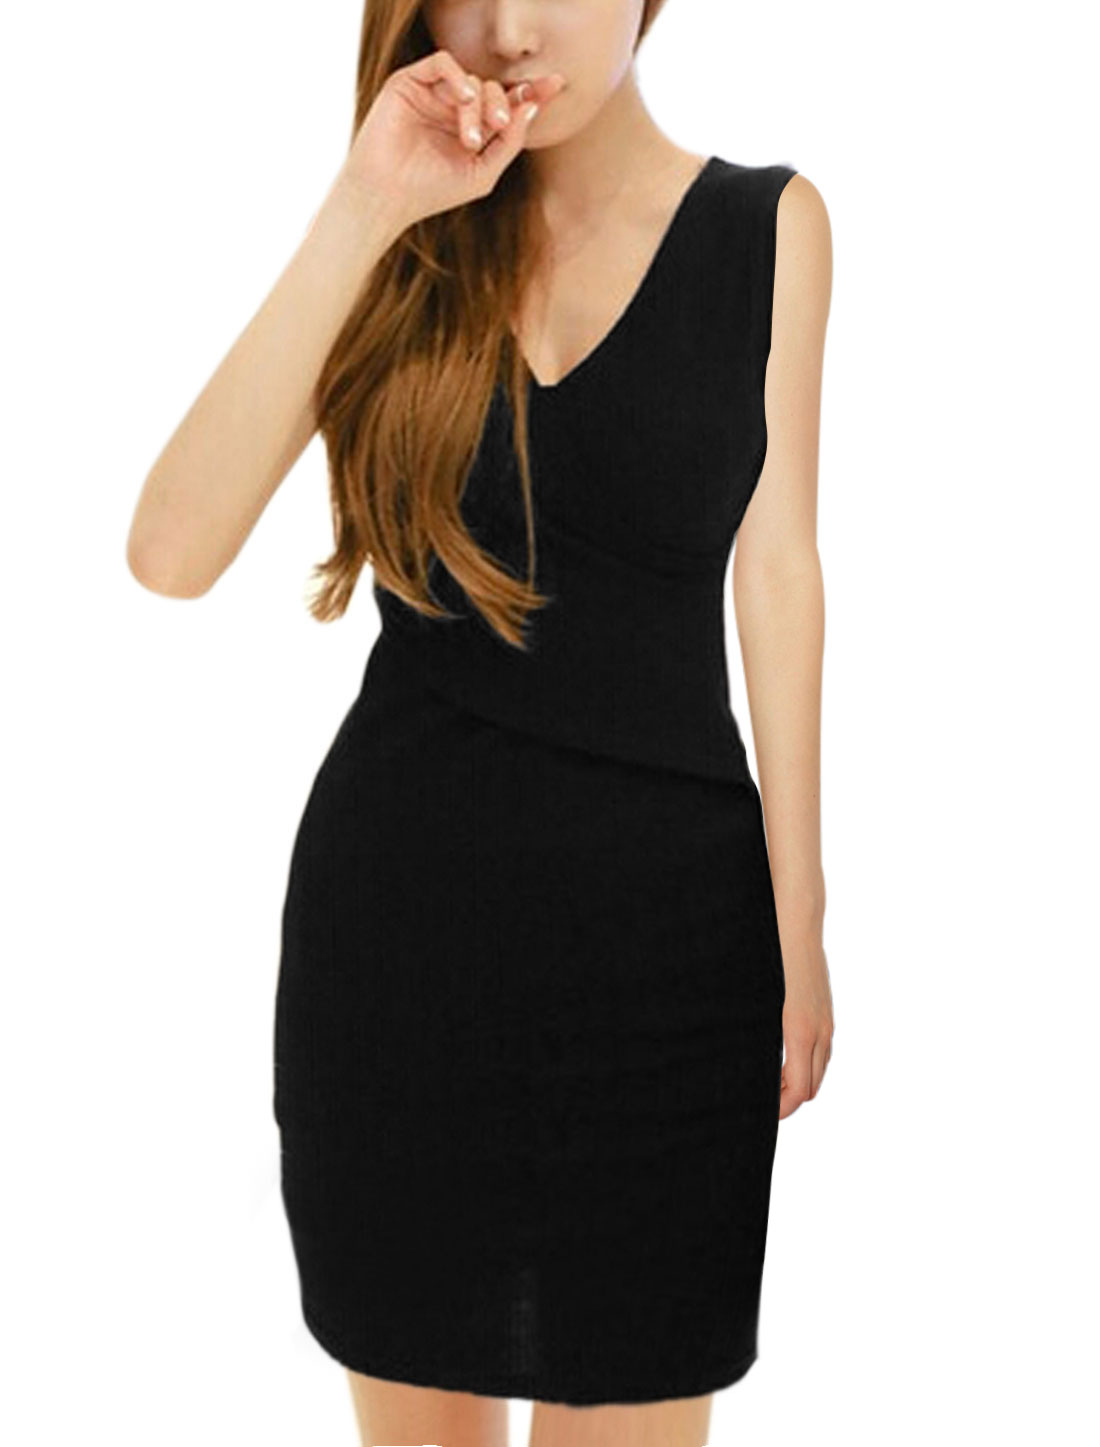 Ladies Crossover V Neck Sleeveless Wiggle Dress Black S